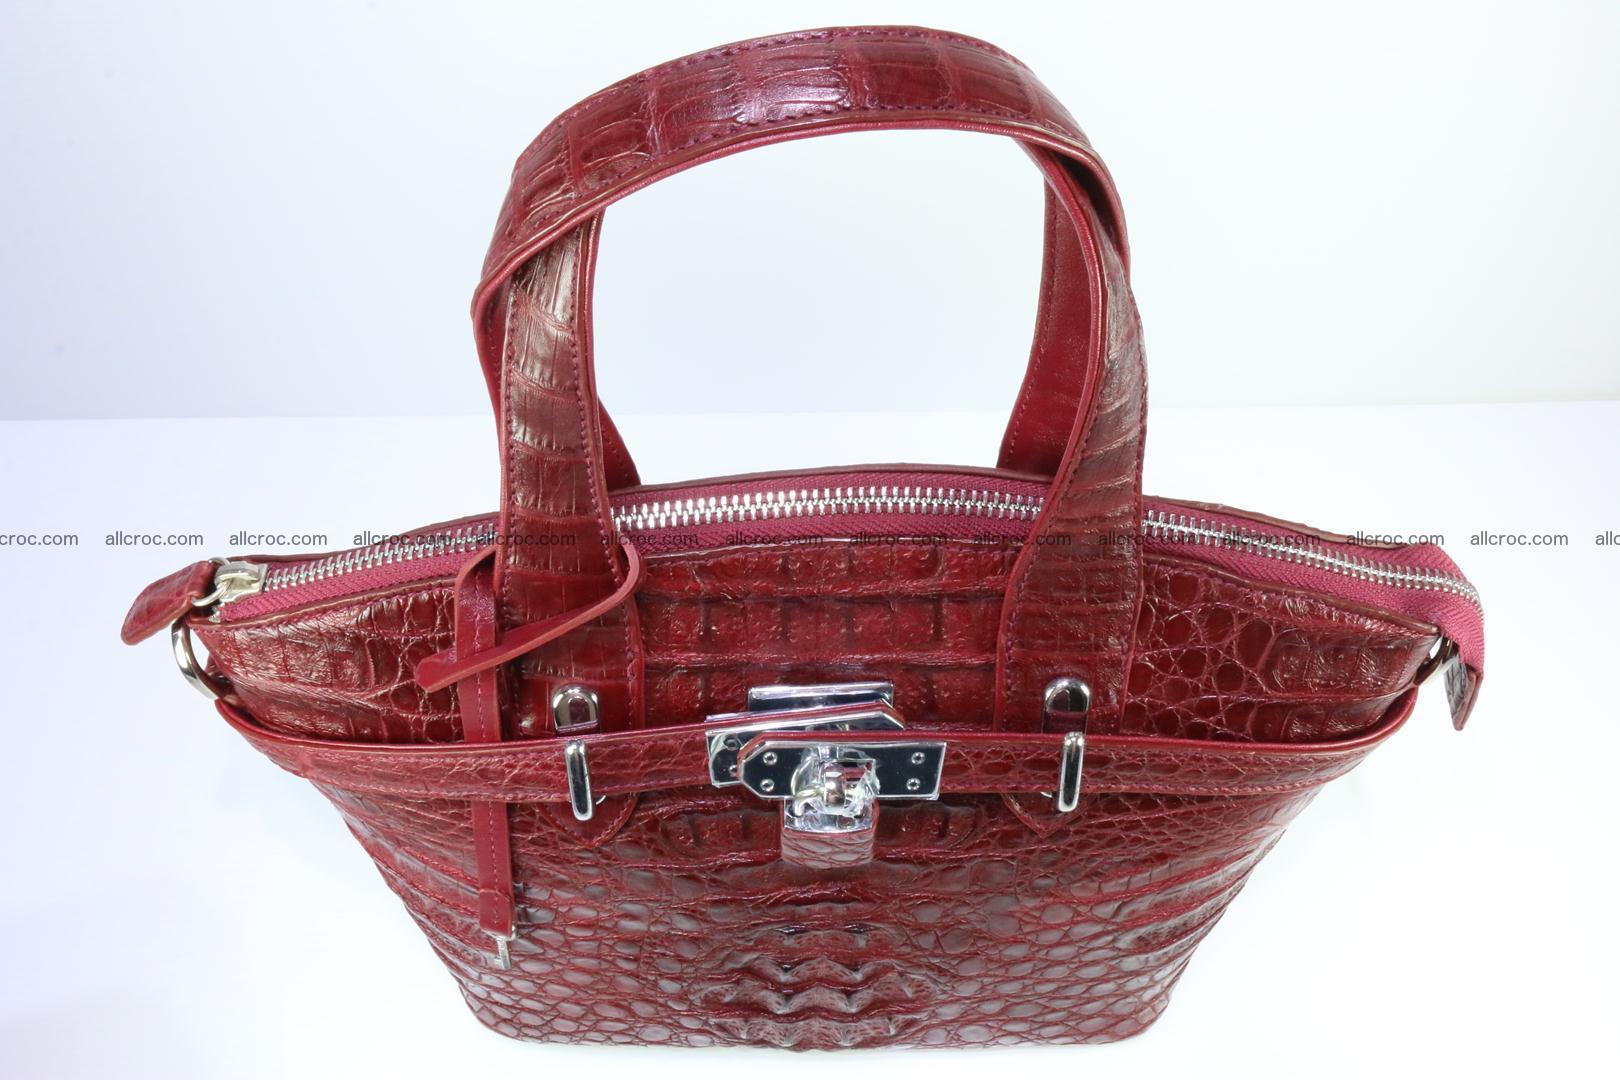 Genuine crocodile handbag for ladies 046 Foto 10